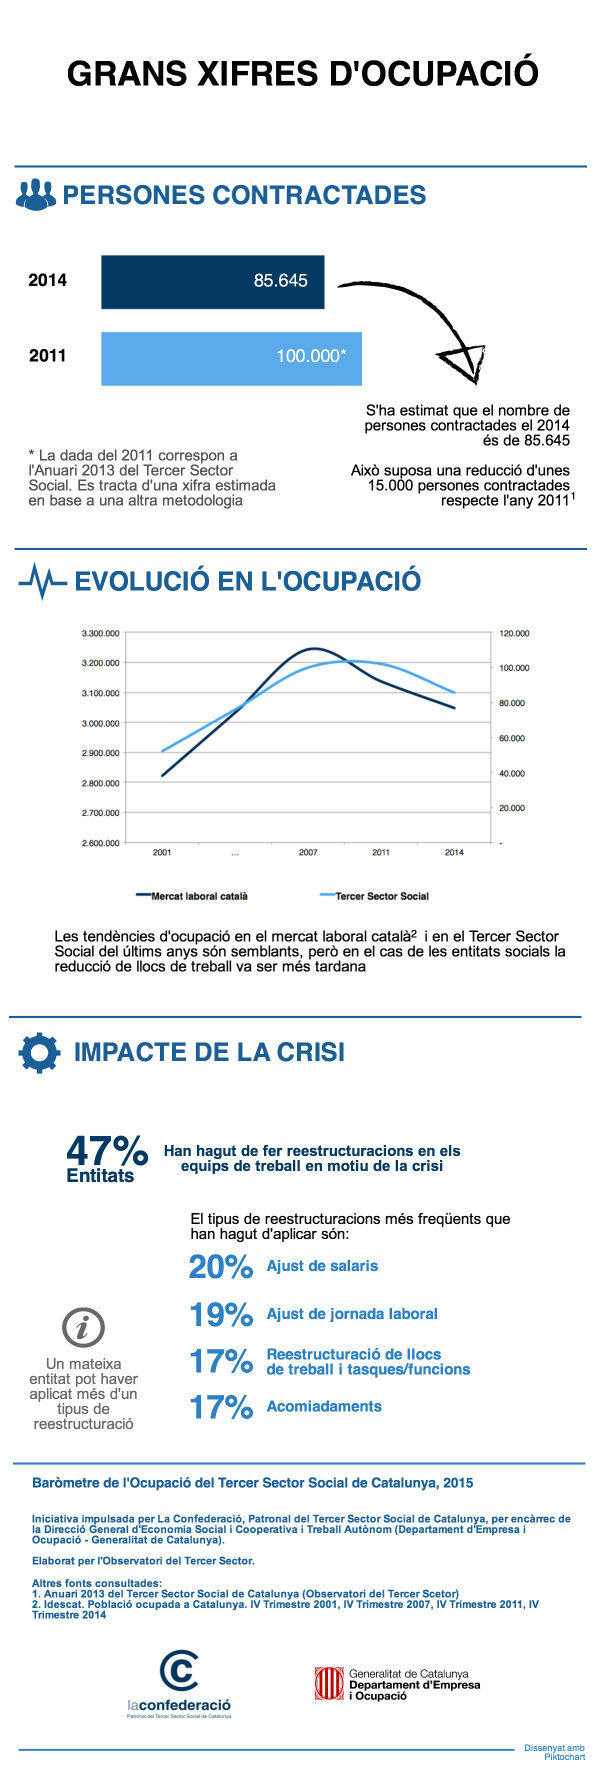 xifres ocupacio 2011-2014 - barometre ocupacio